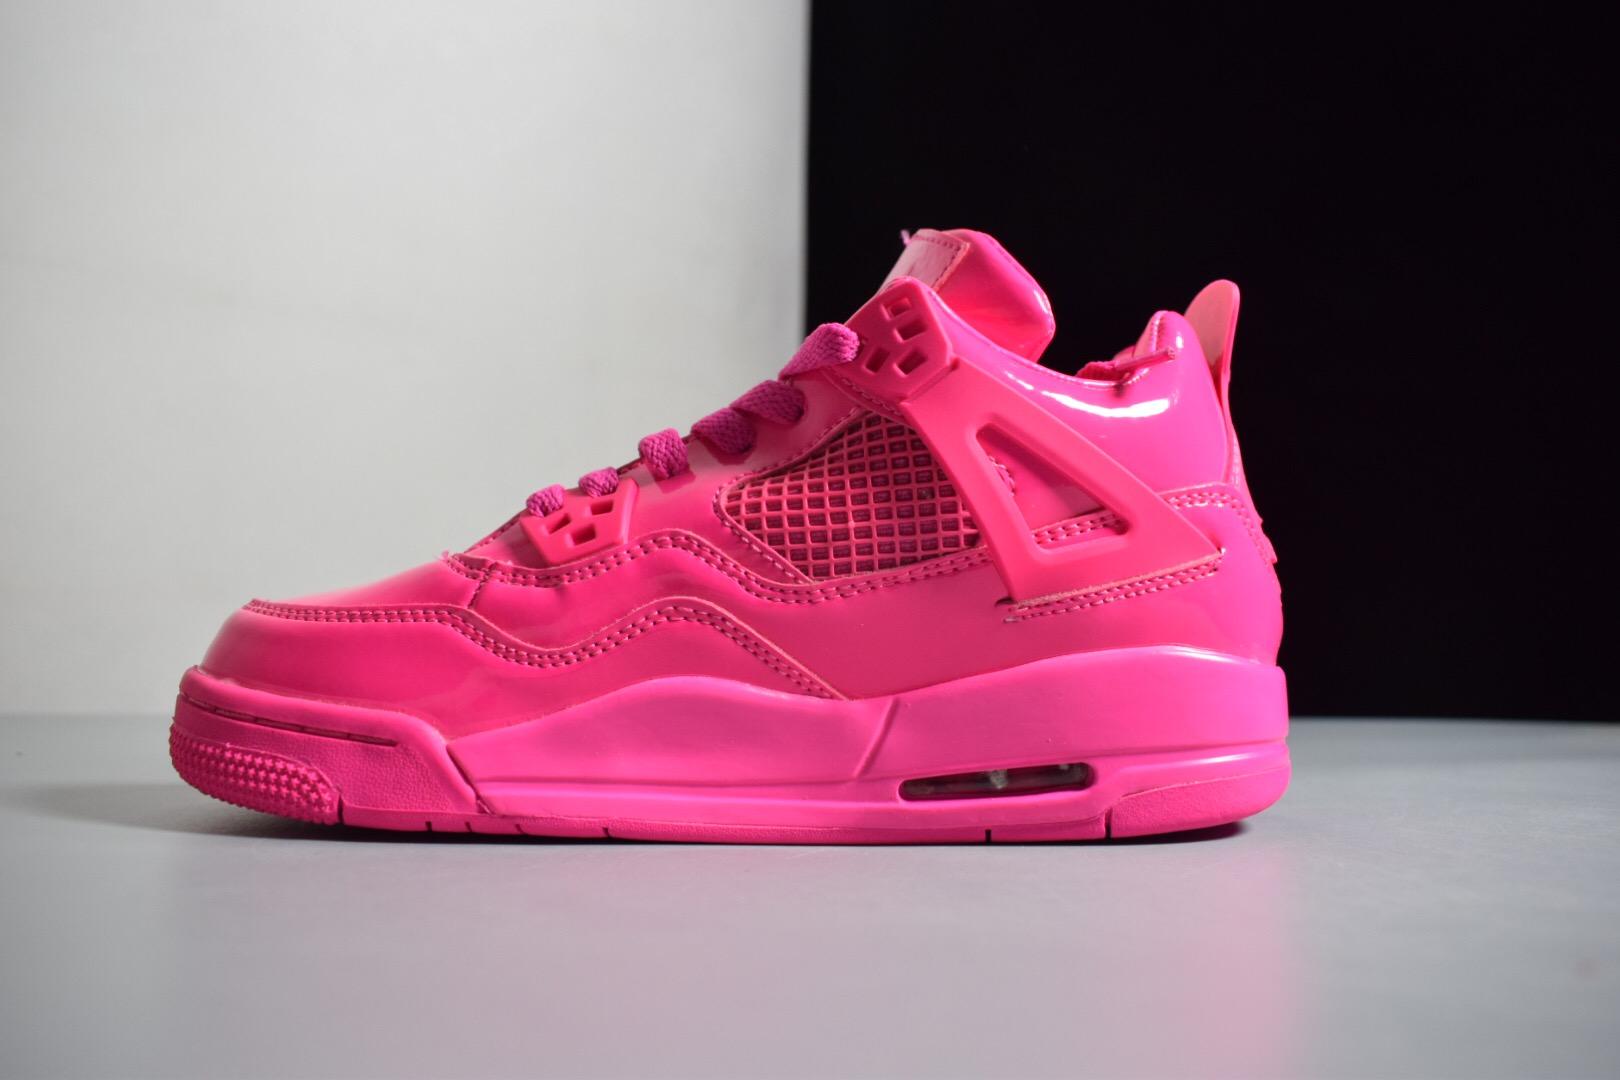 Women s Air Jordan 4 Retro GS 11Lab4 Pink Patent Leather For Sale 68d53476a